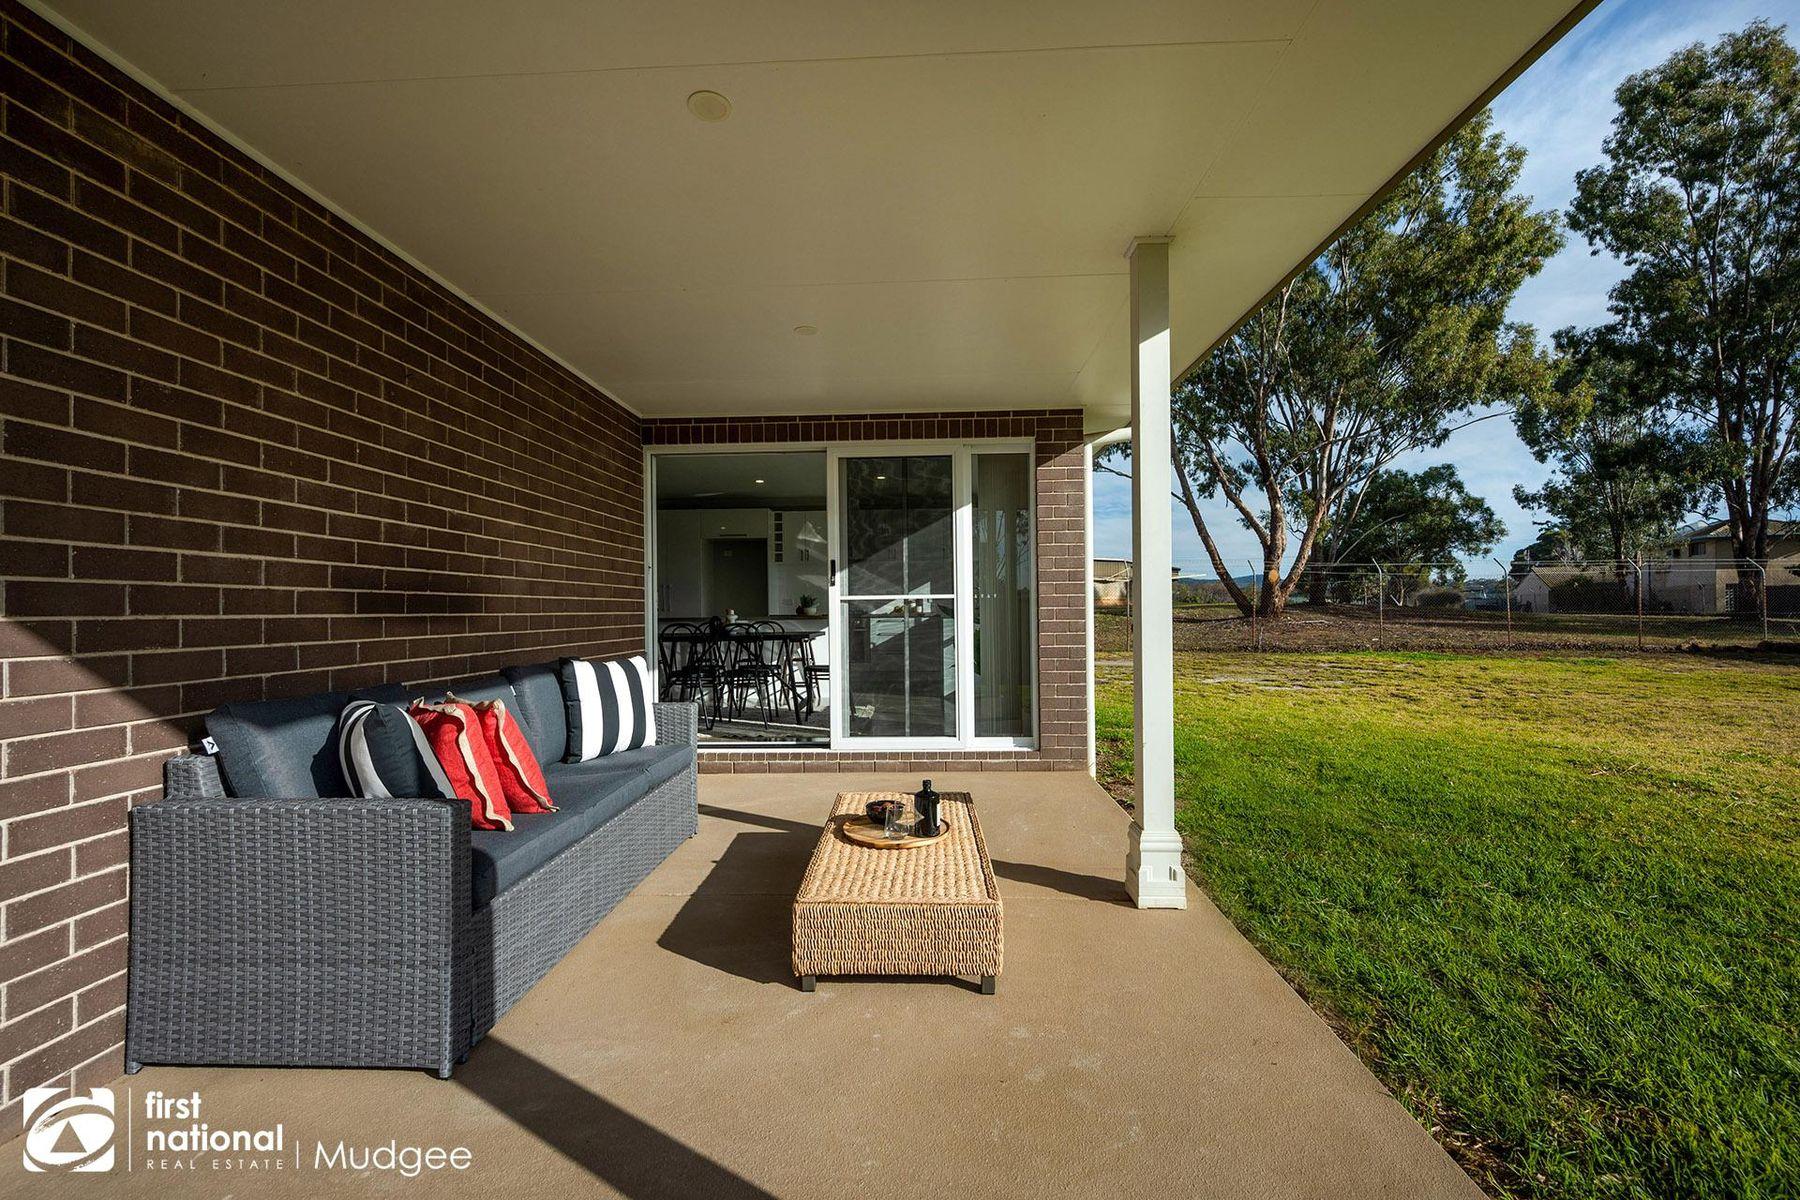 5 Stan Boal Court, Mudgee, NSW 2850